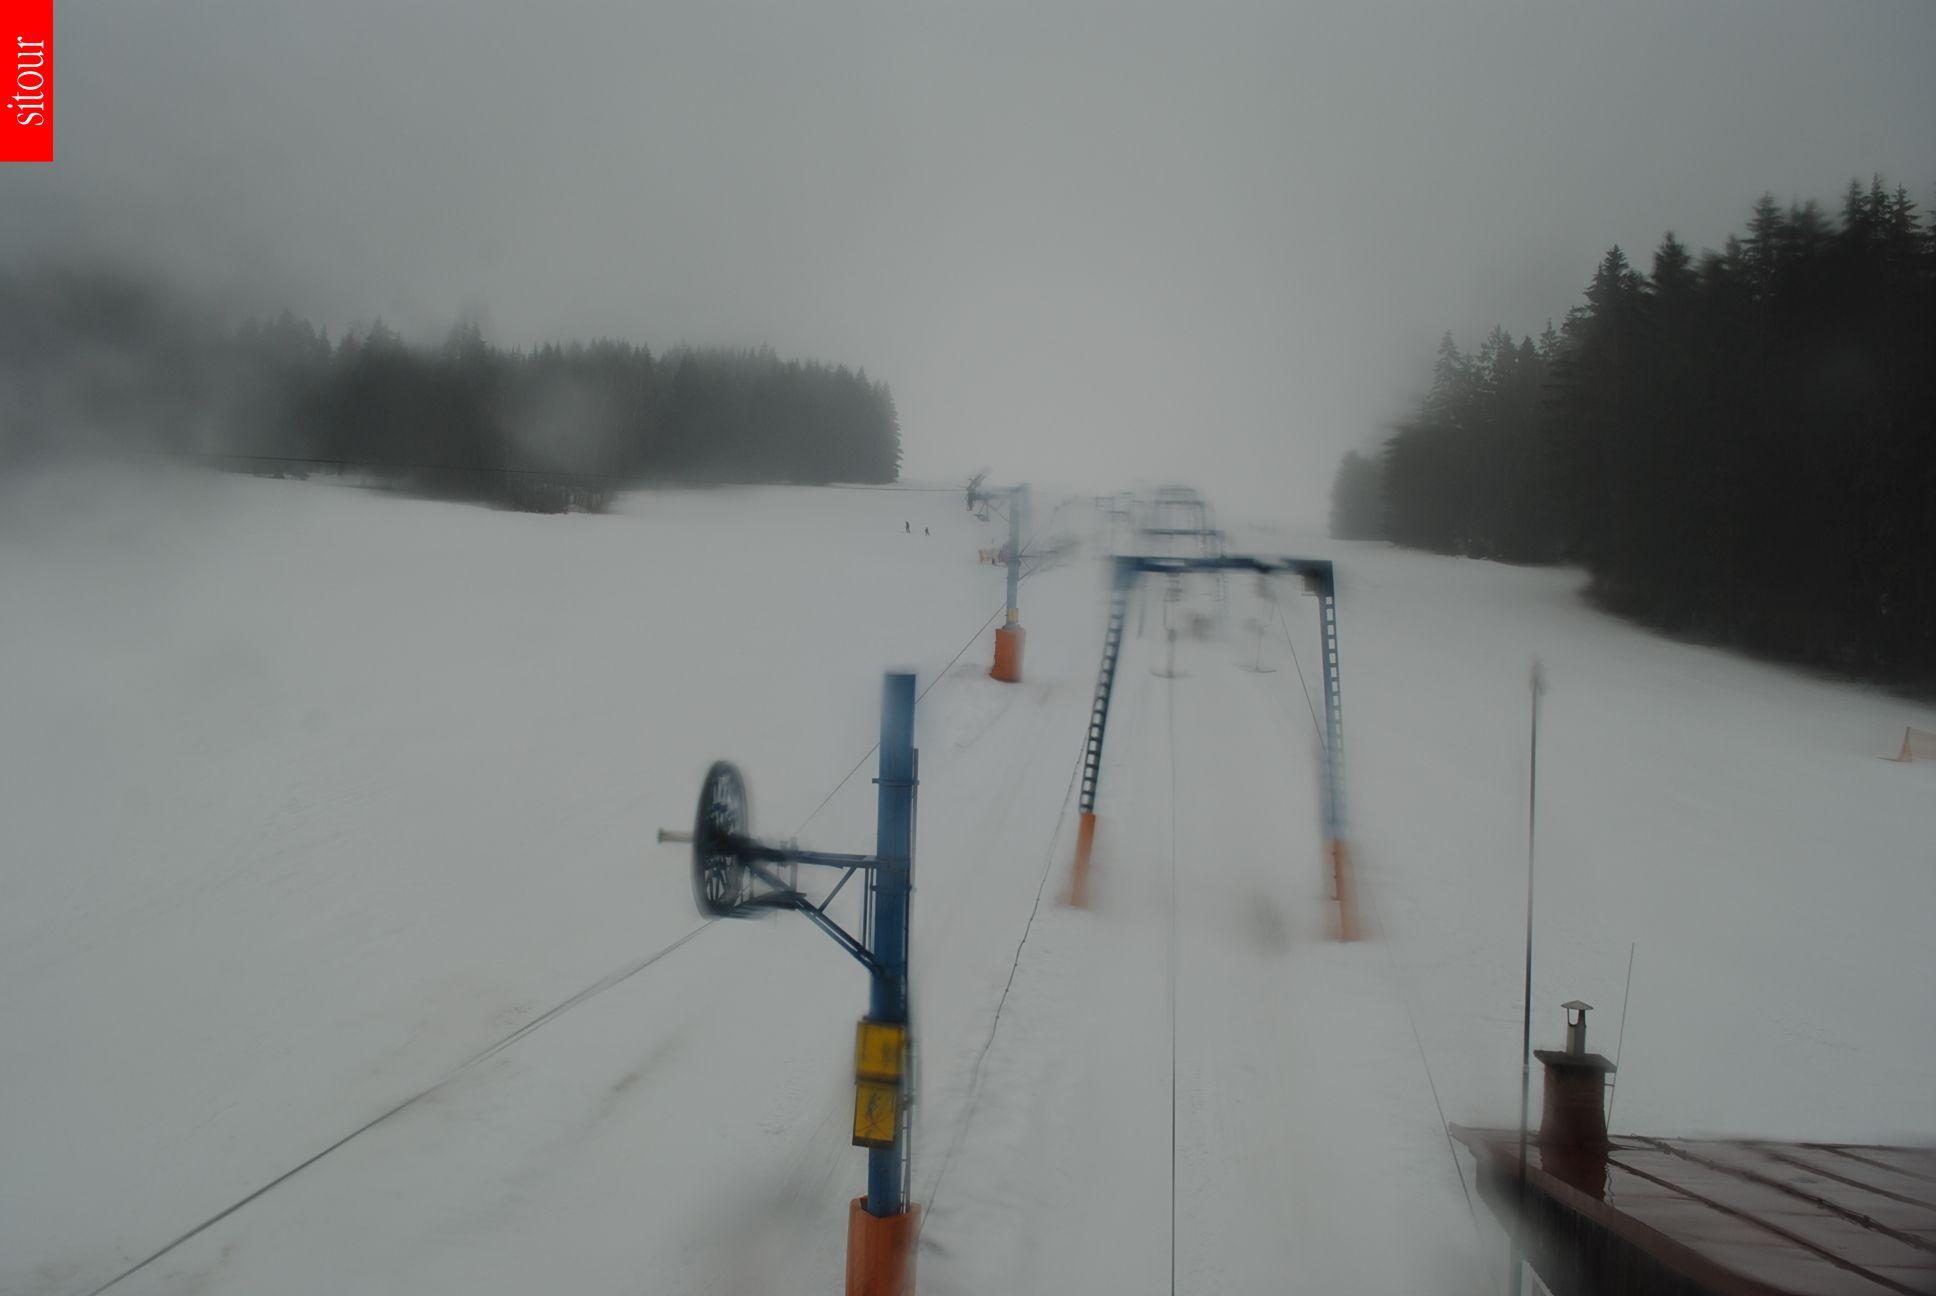 Kamera Rokytnice nad Jizerou - Studenov